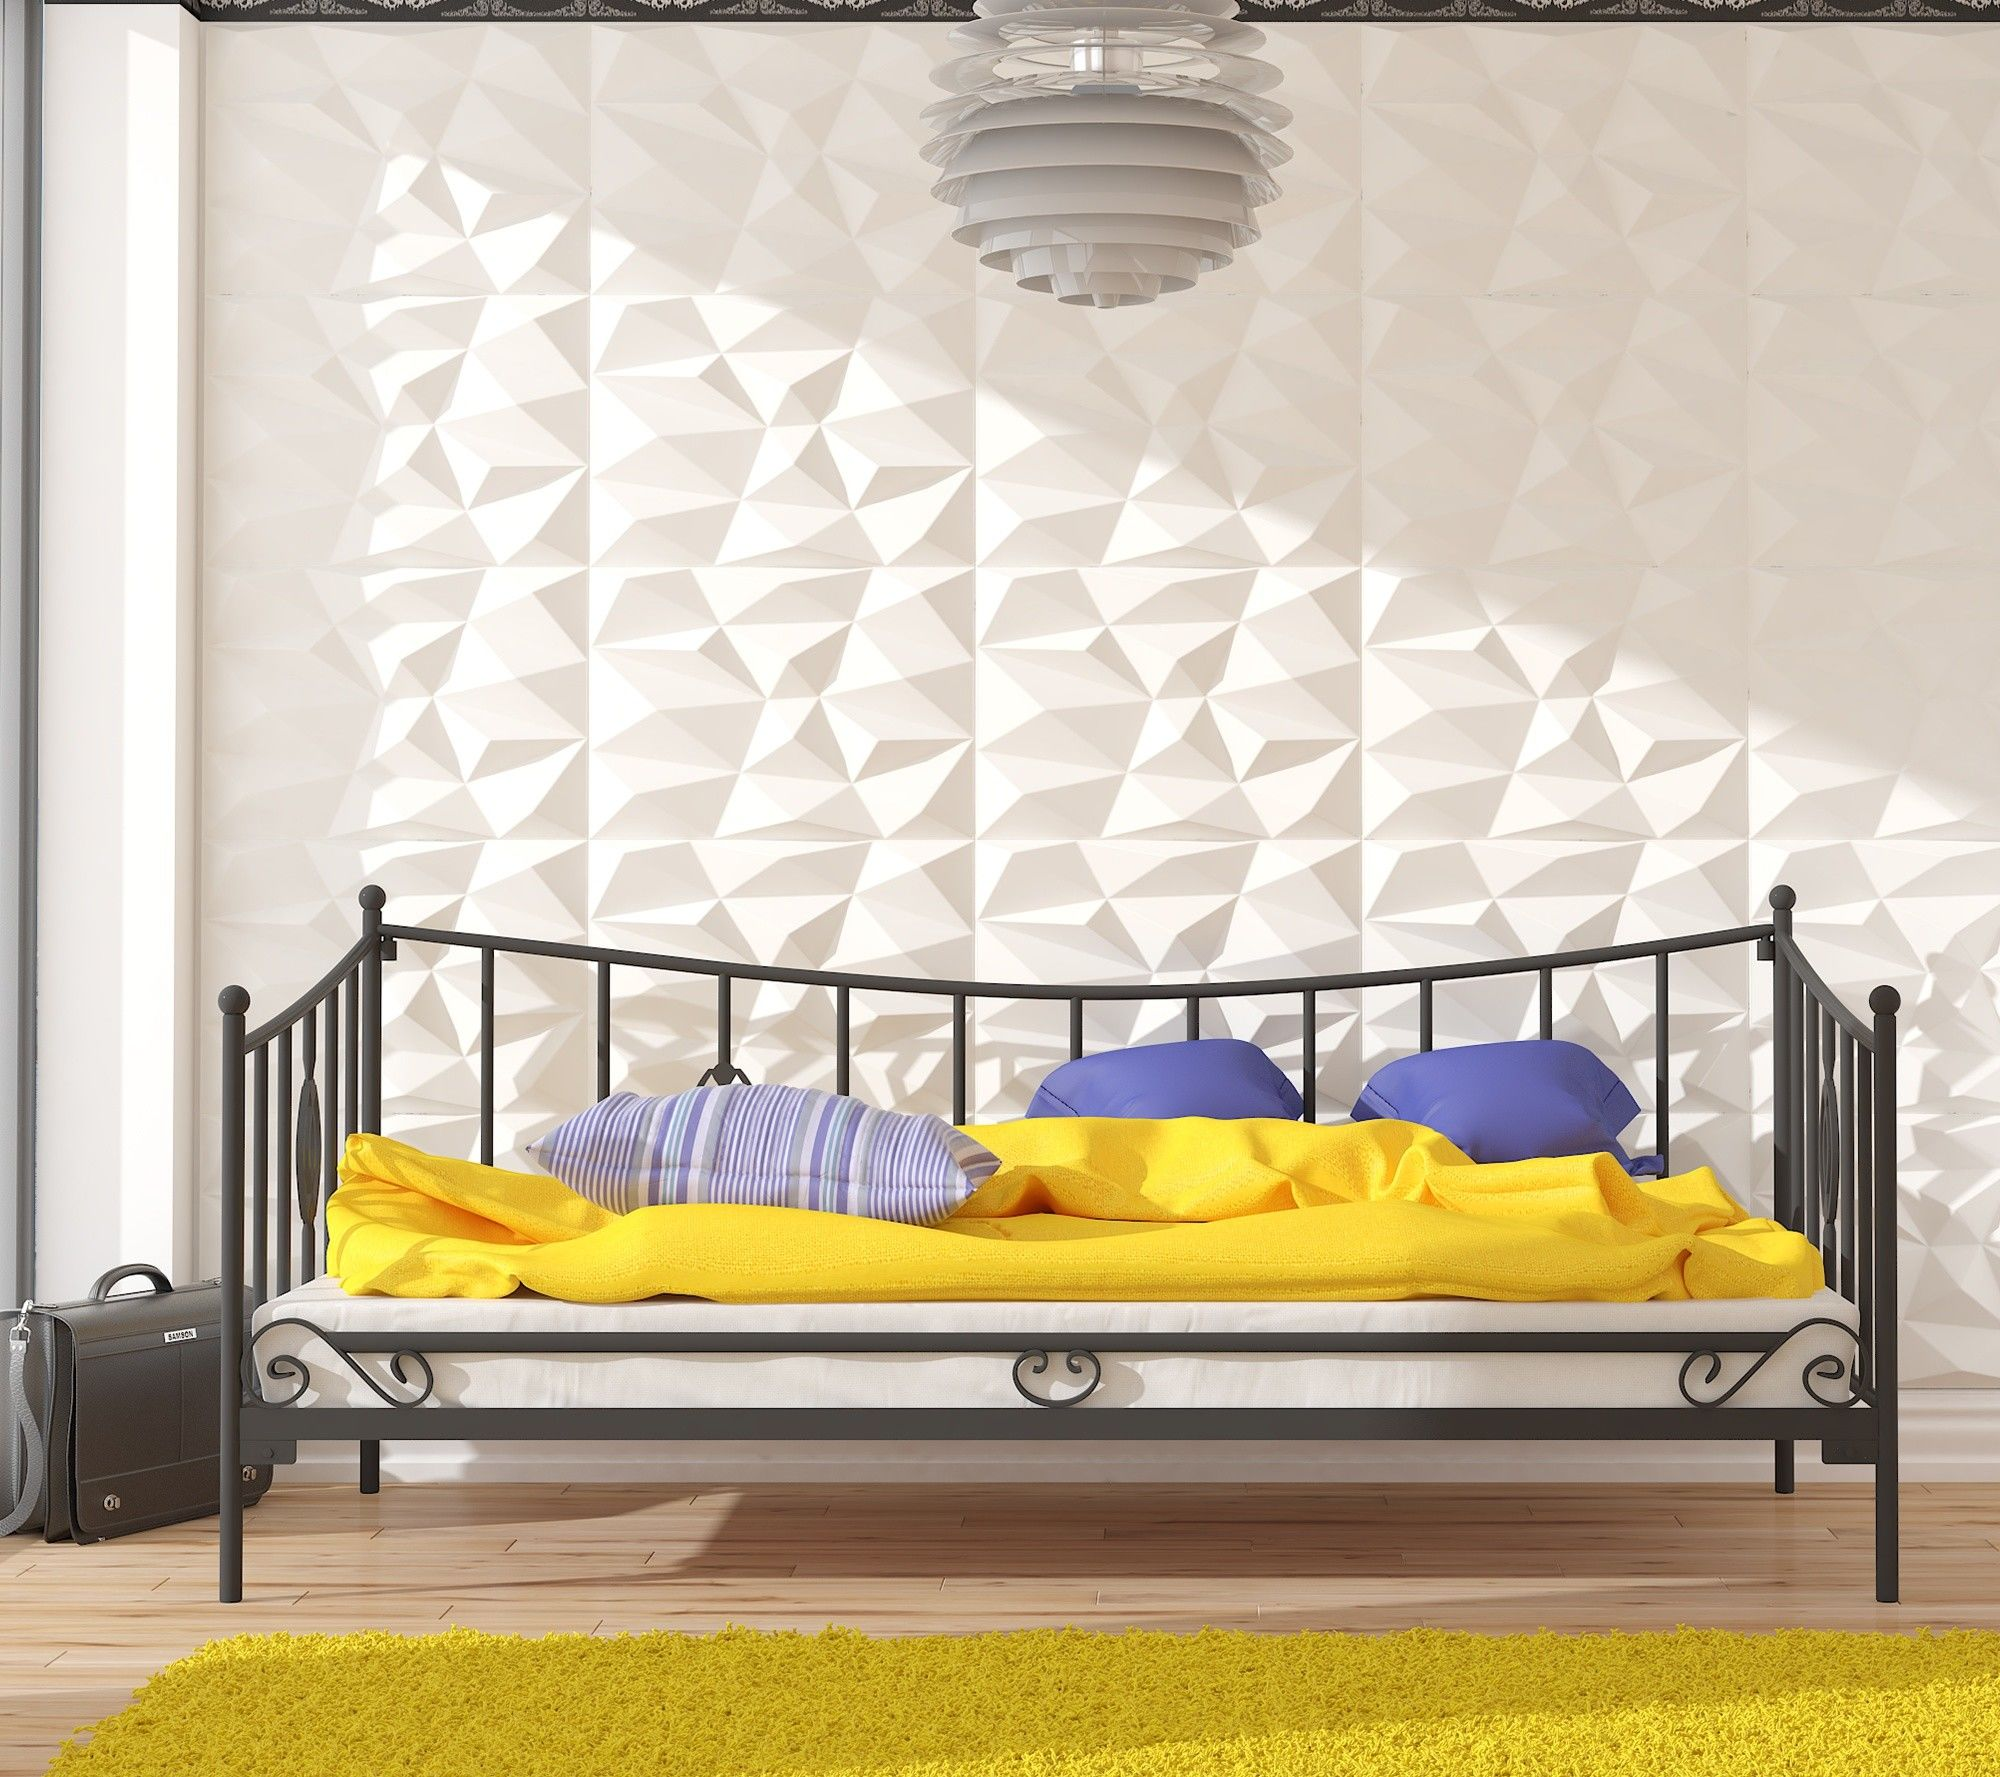 Łóżko metalowe sofa 80x180 wzór 31 ze stelażem